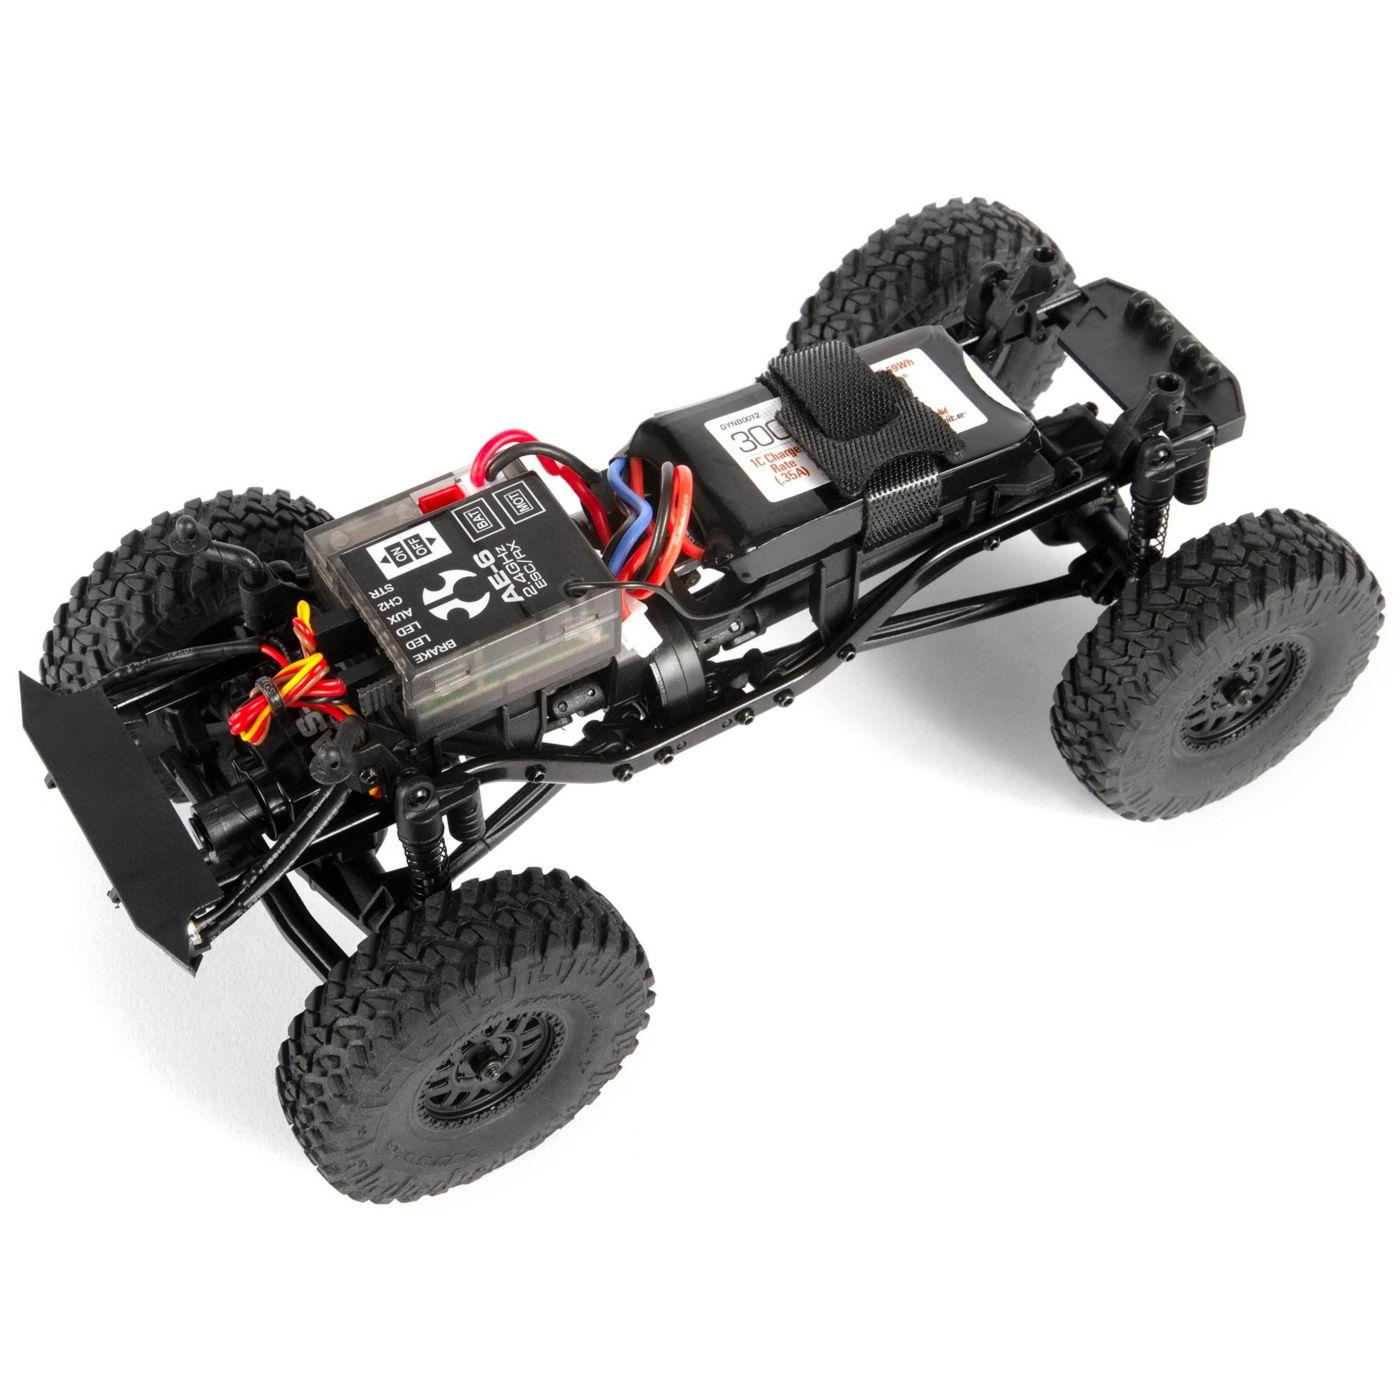 Axial SCX24 Deadbolt - Chassis